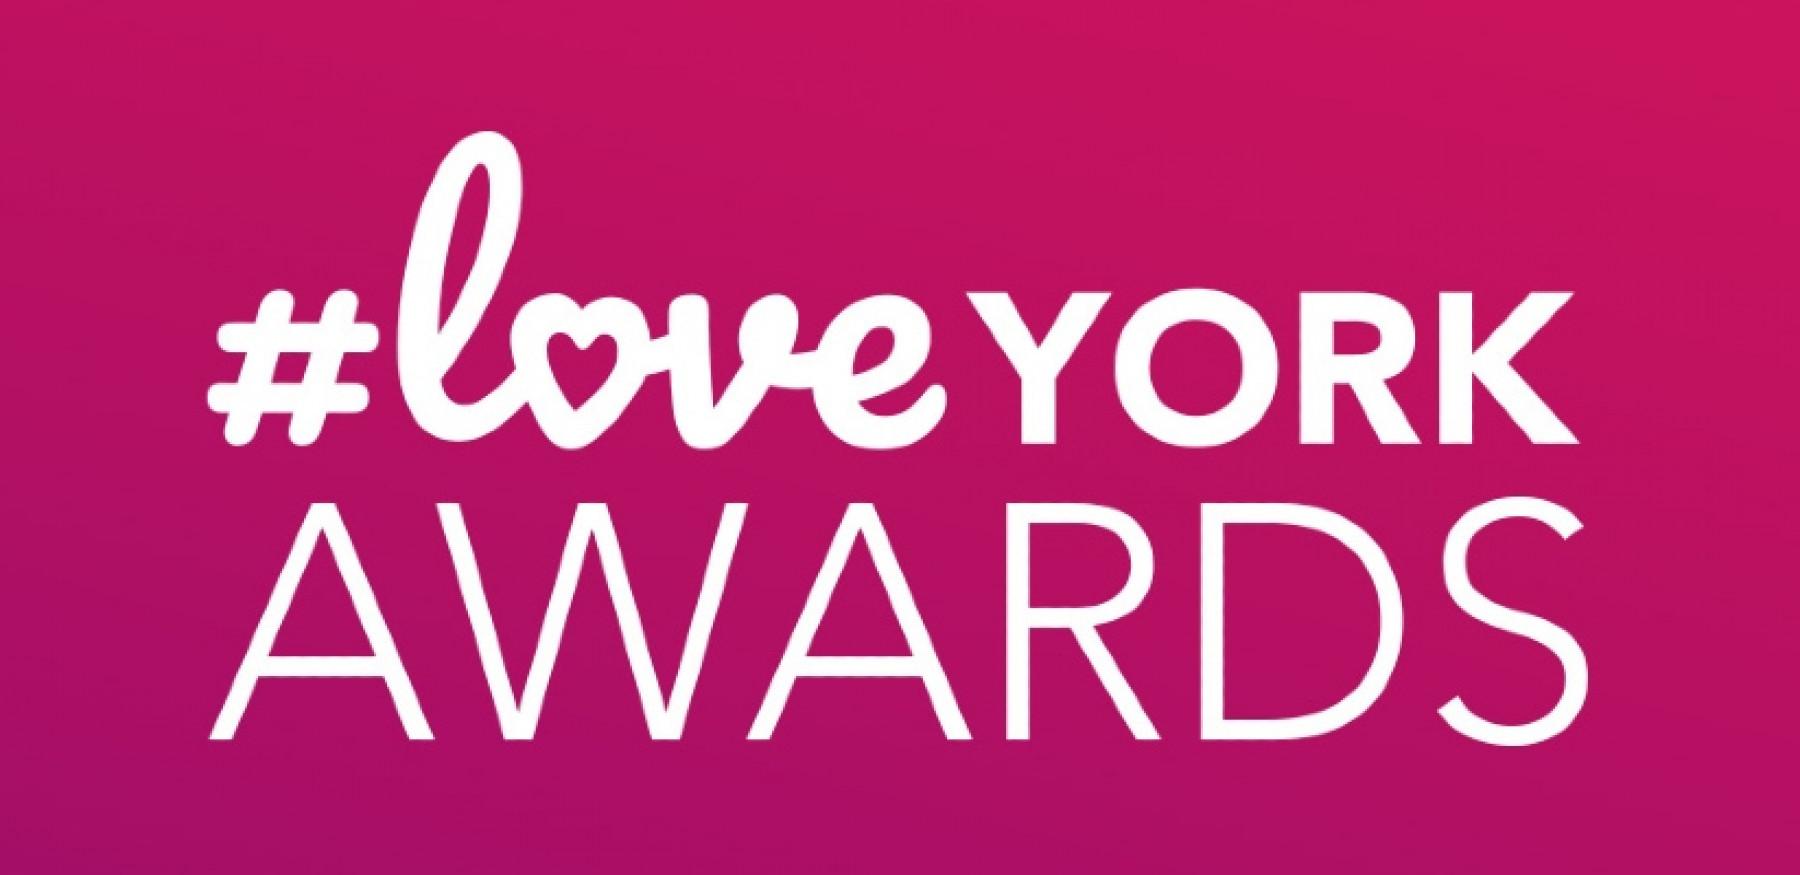 Love York Awards blog